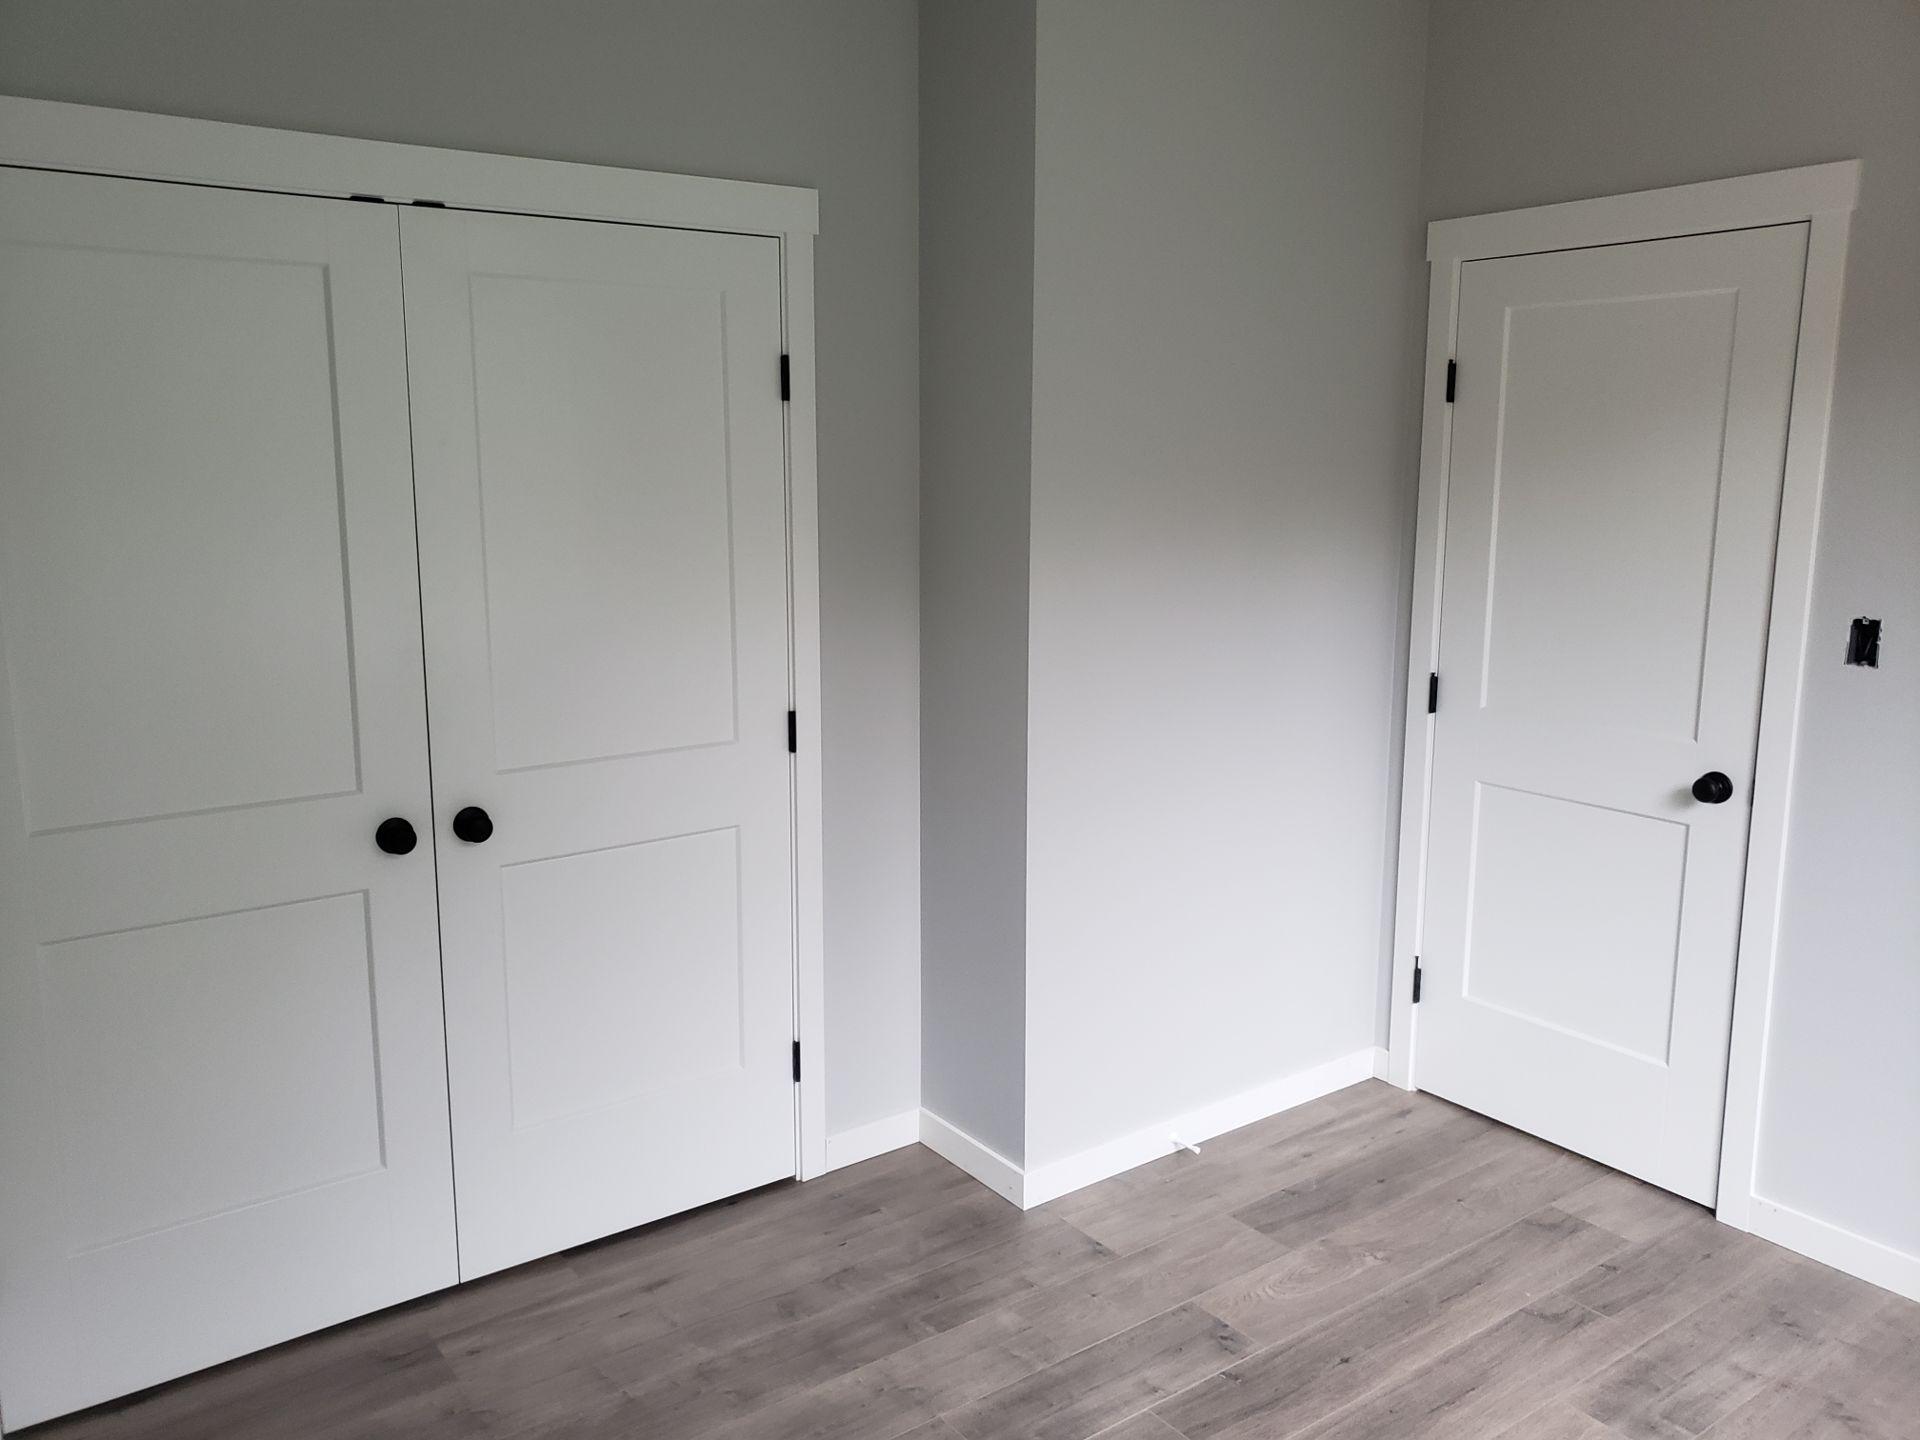 Cutting trim inside finished house-20180930_154219-01.jpeg